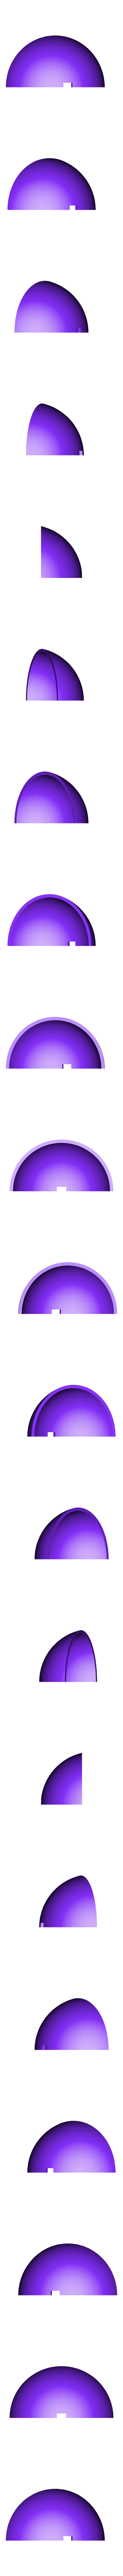 74TRK-GRILL DOME.stl Download STL file Ratrod Pickup • 3D printing template, macone1